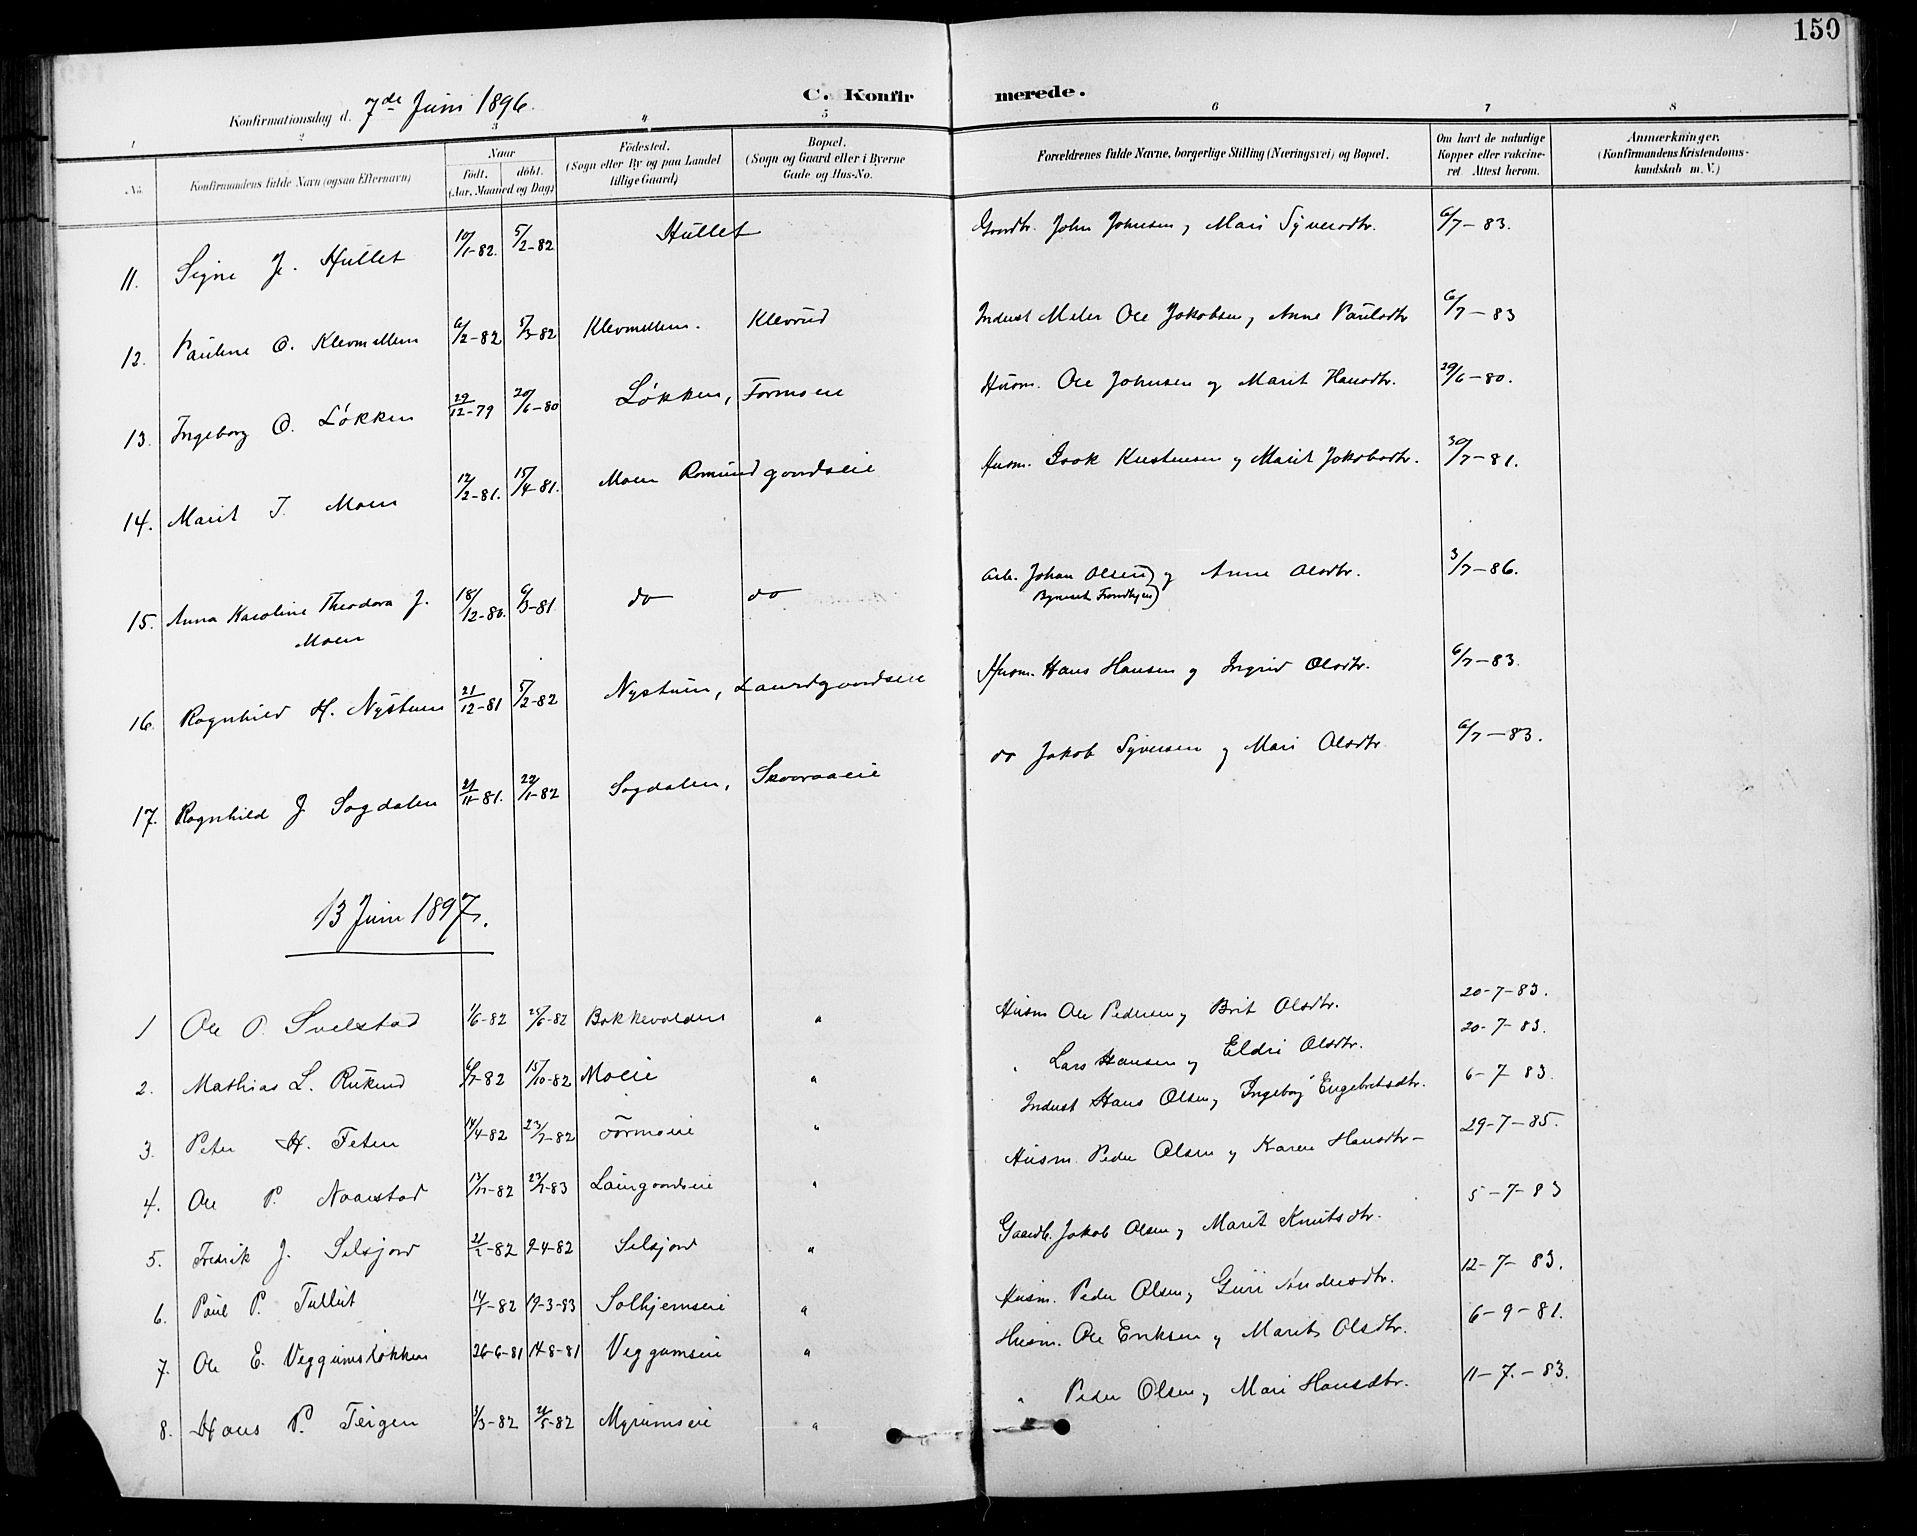 SAH, Sel prestekontor, Klokkerbok nr. 1, 1894-1923, s. 150